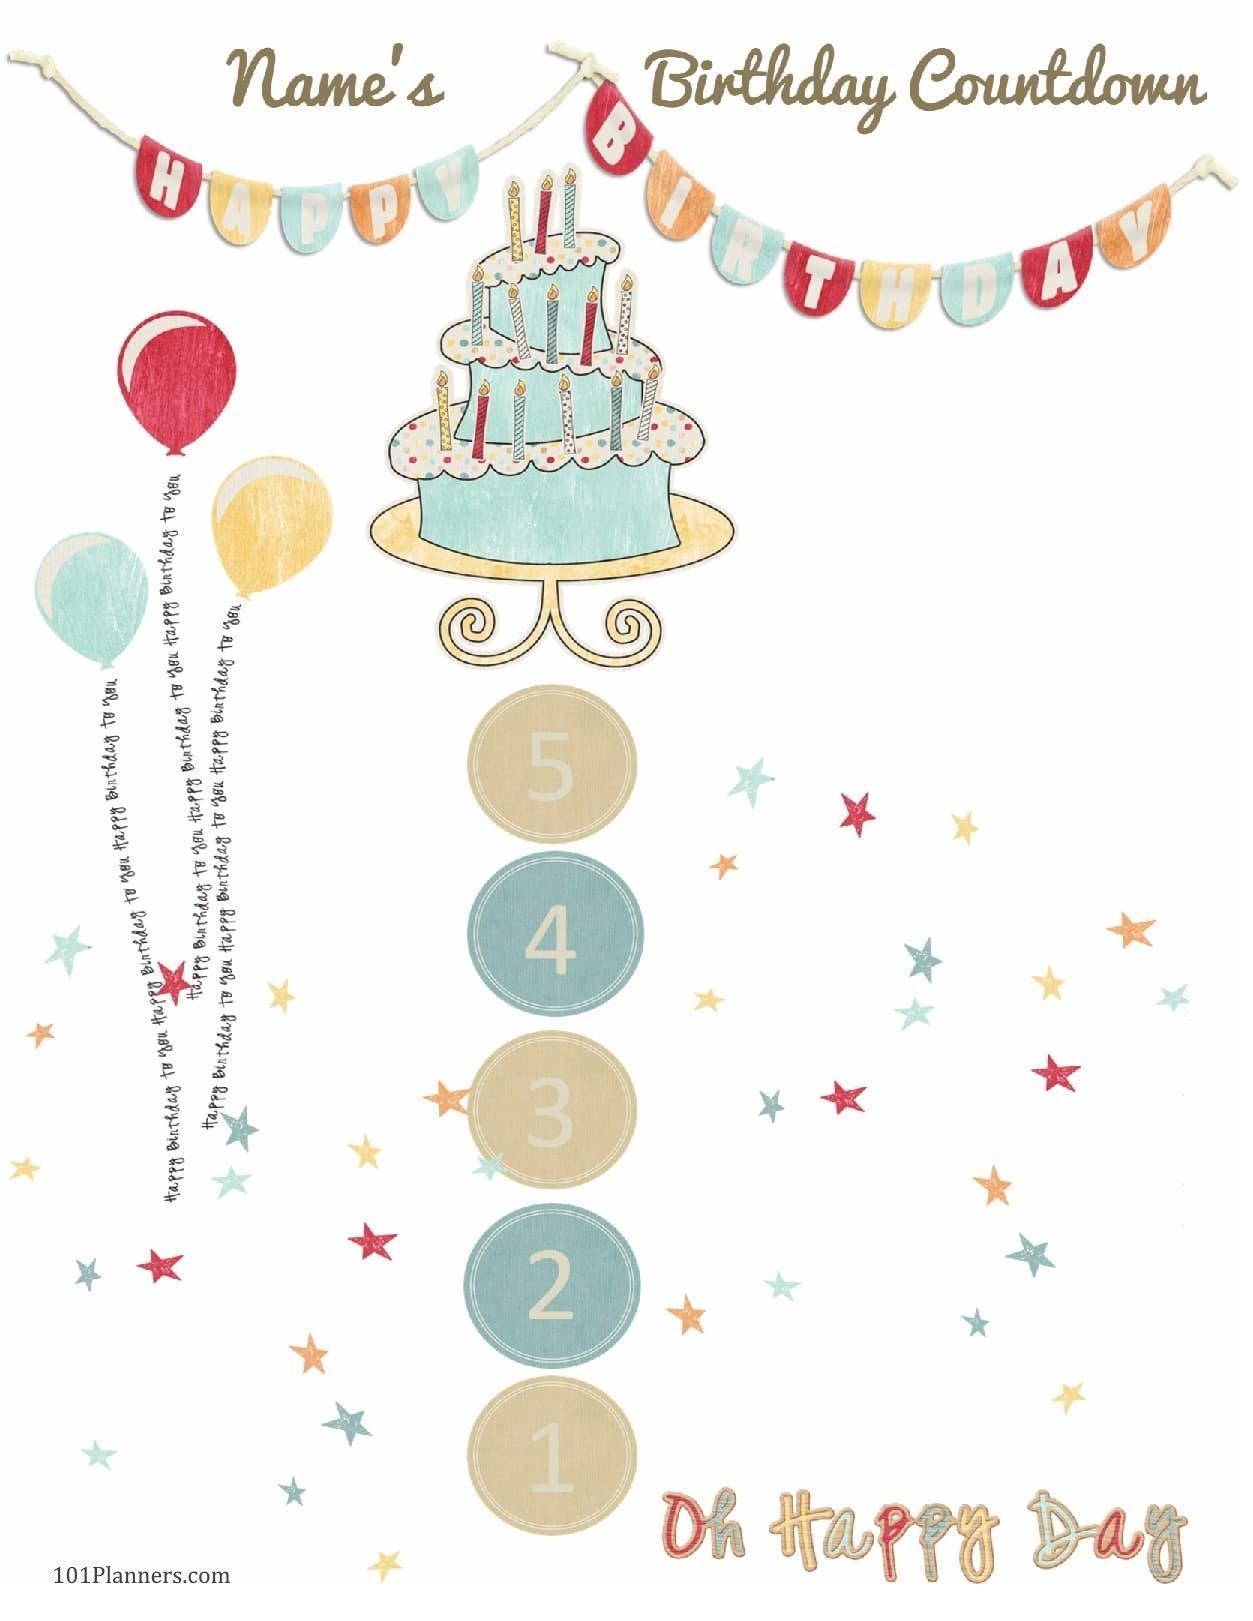 6 Colorful Birthday Countdown Calendars | Kittybabylove Pregnancy Countdown Calendar Printable Free